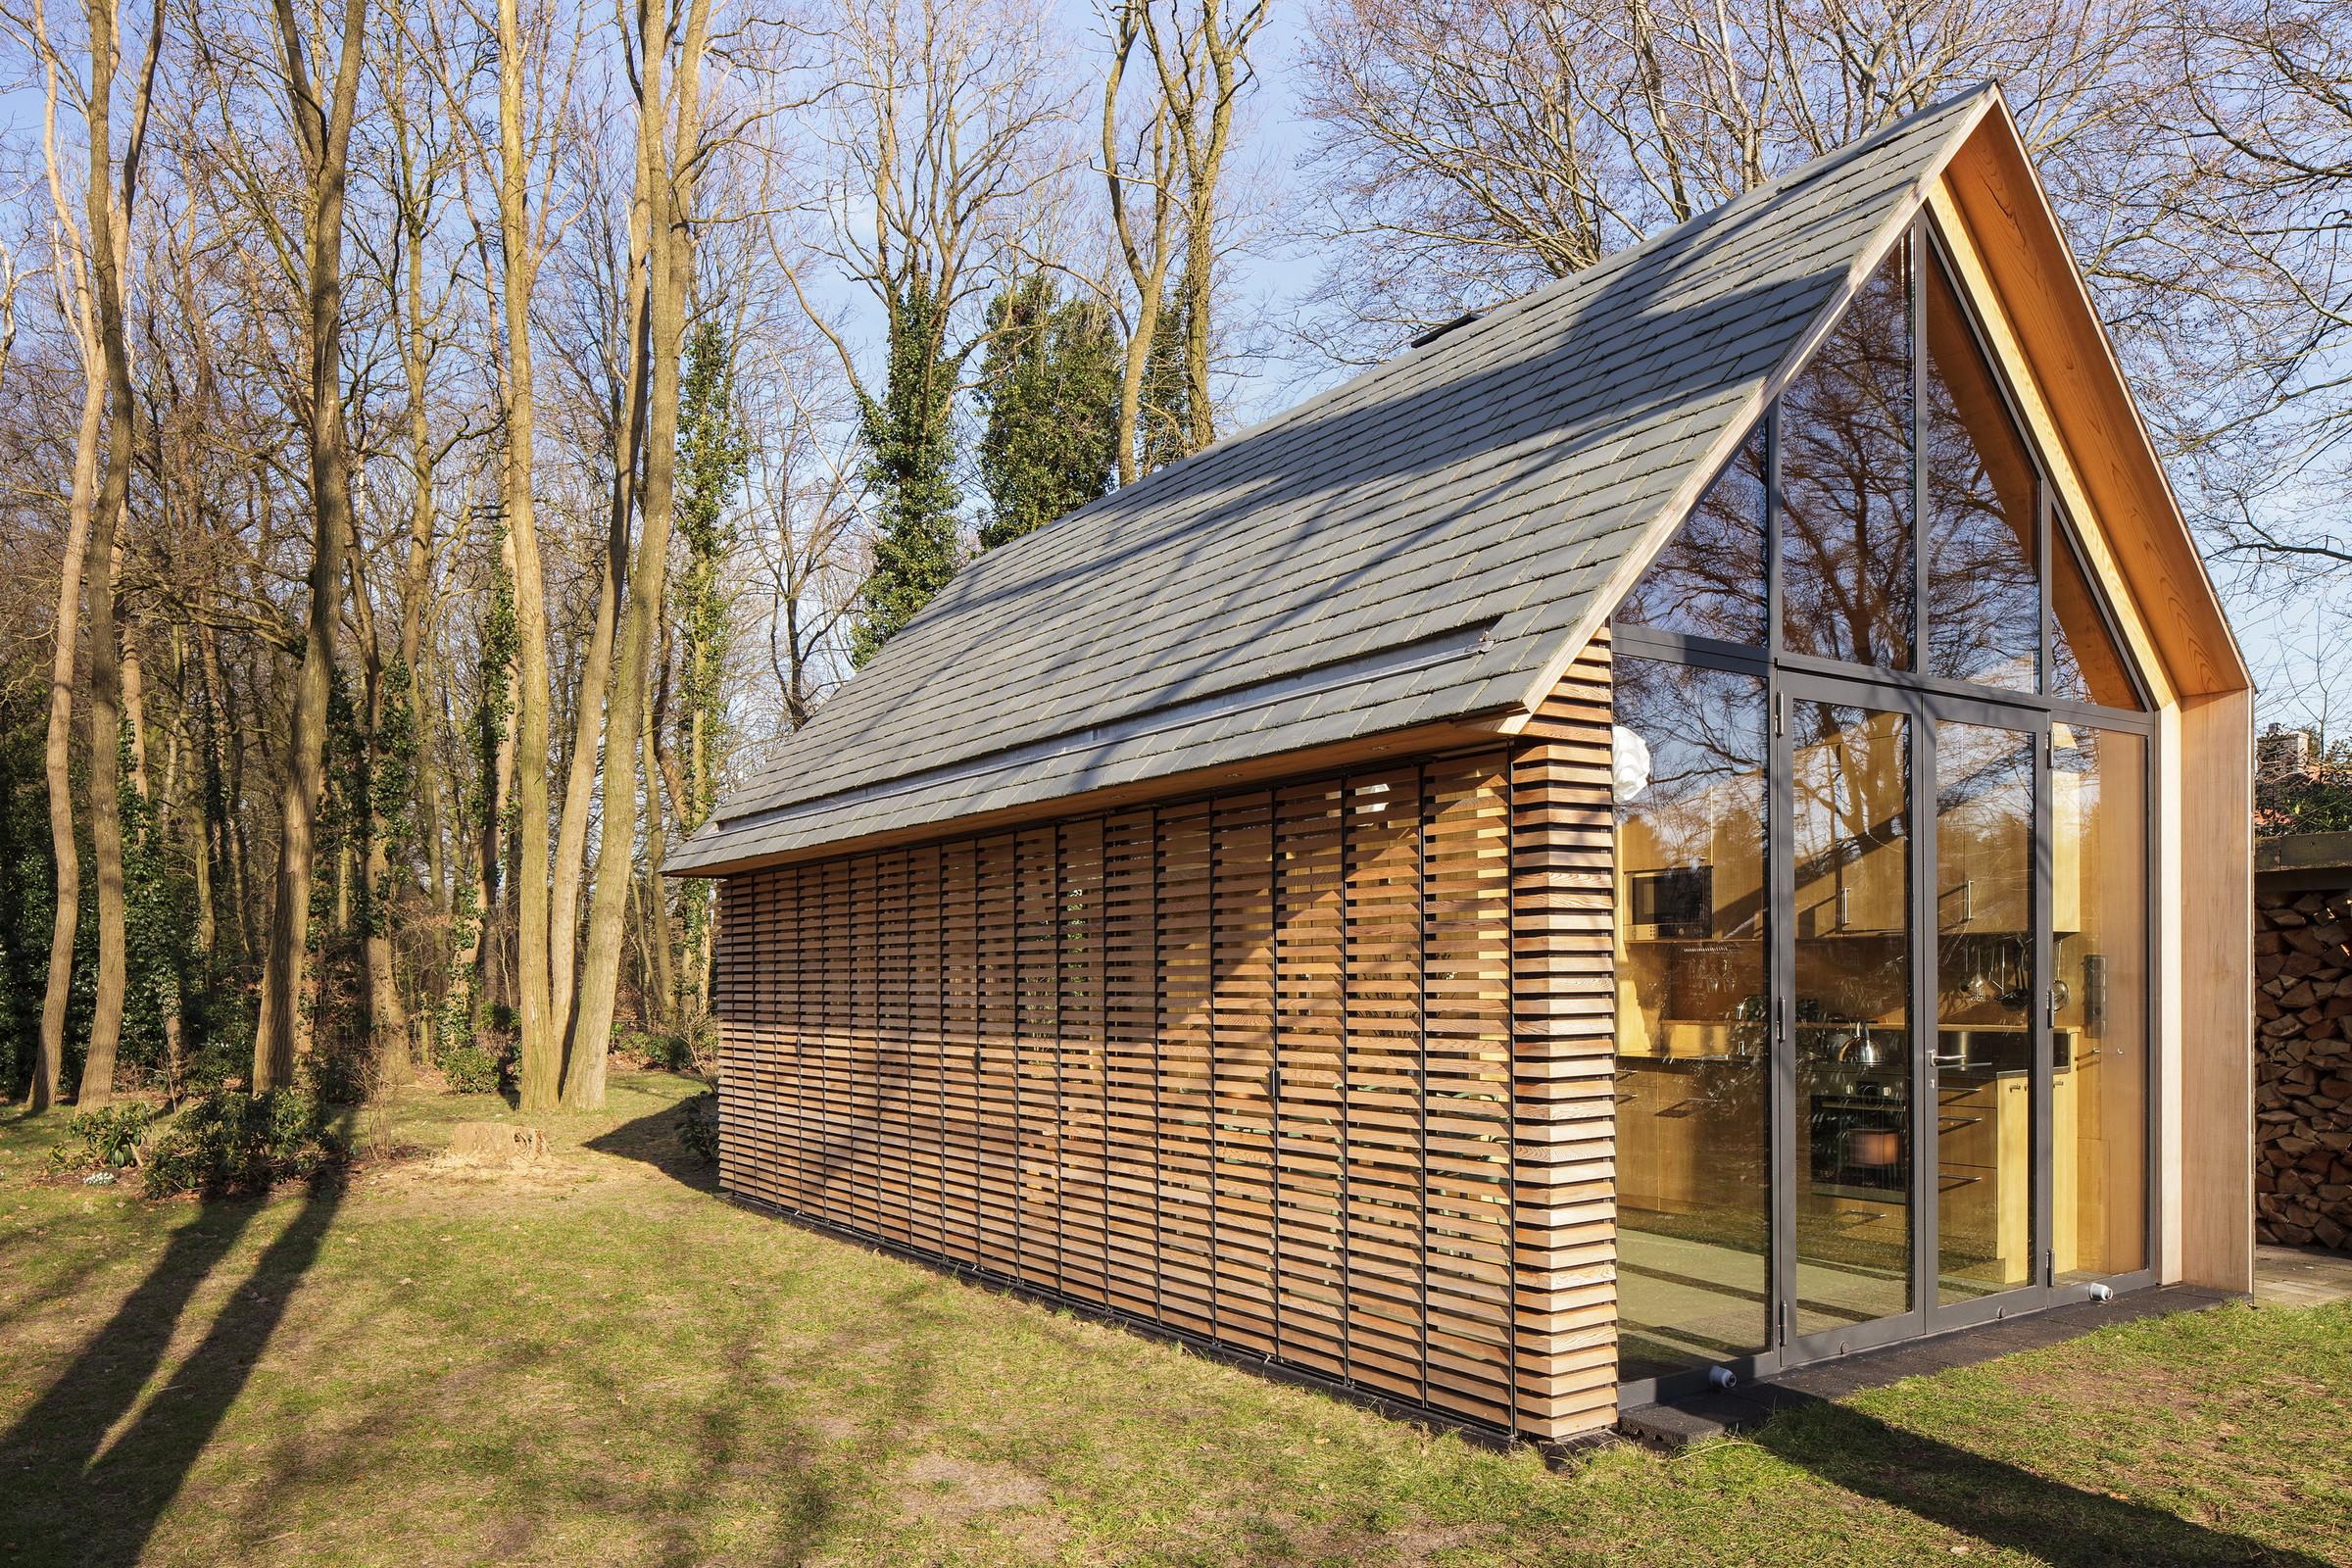 Beste Modern Design Inspiration : Cozy Cabins - Studio MM Architect FX-91